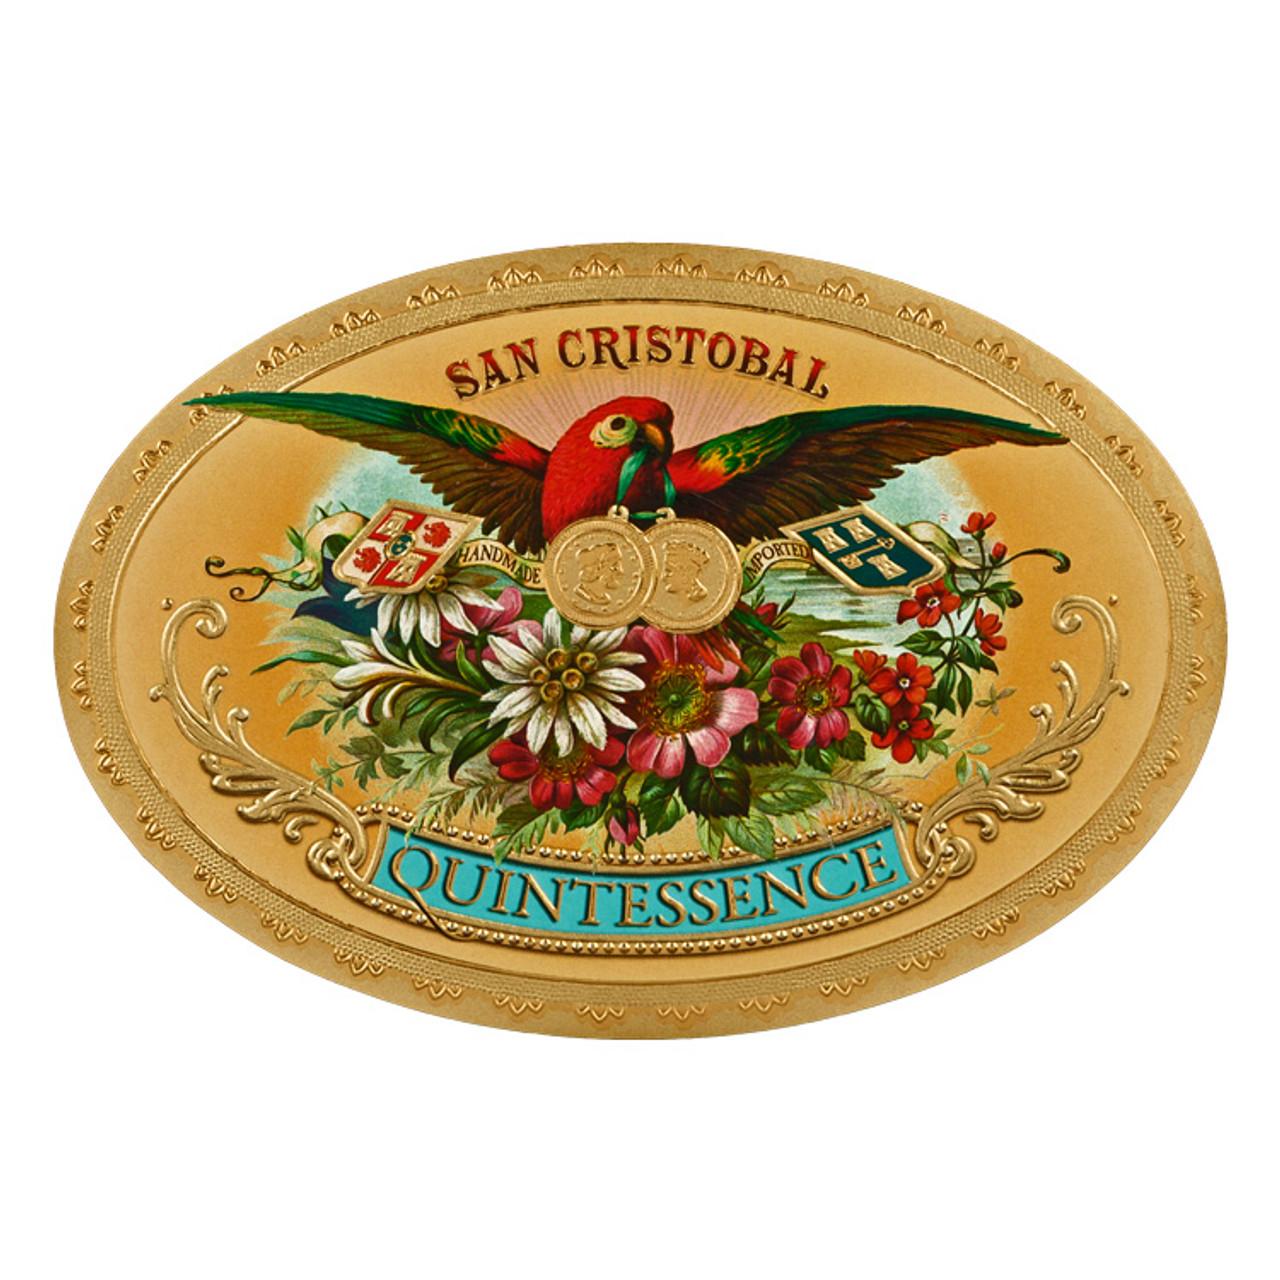 San Cristobal Quintessence Epicure Cigars - 6 x 52 (Box of 24)